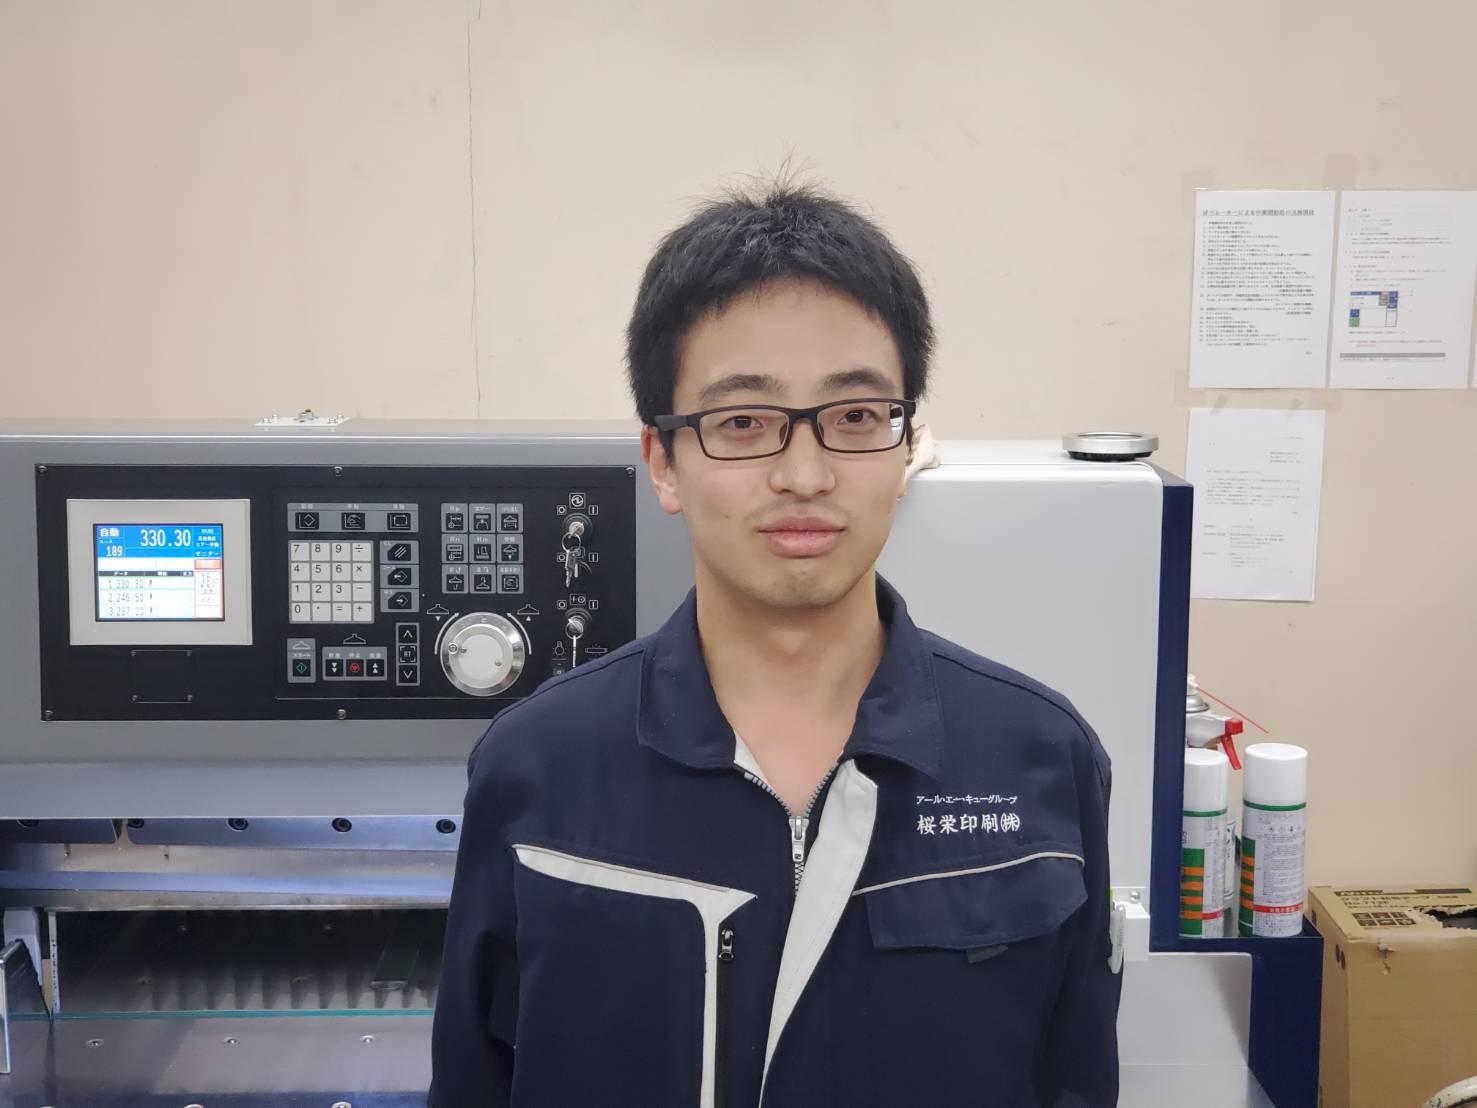 Fukui Daisuke